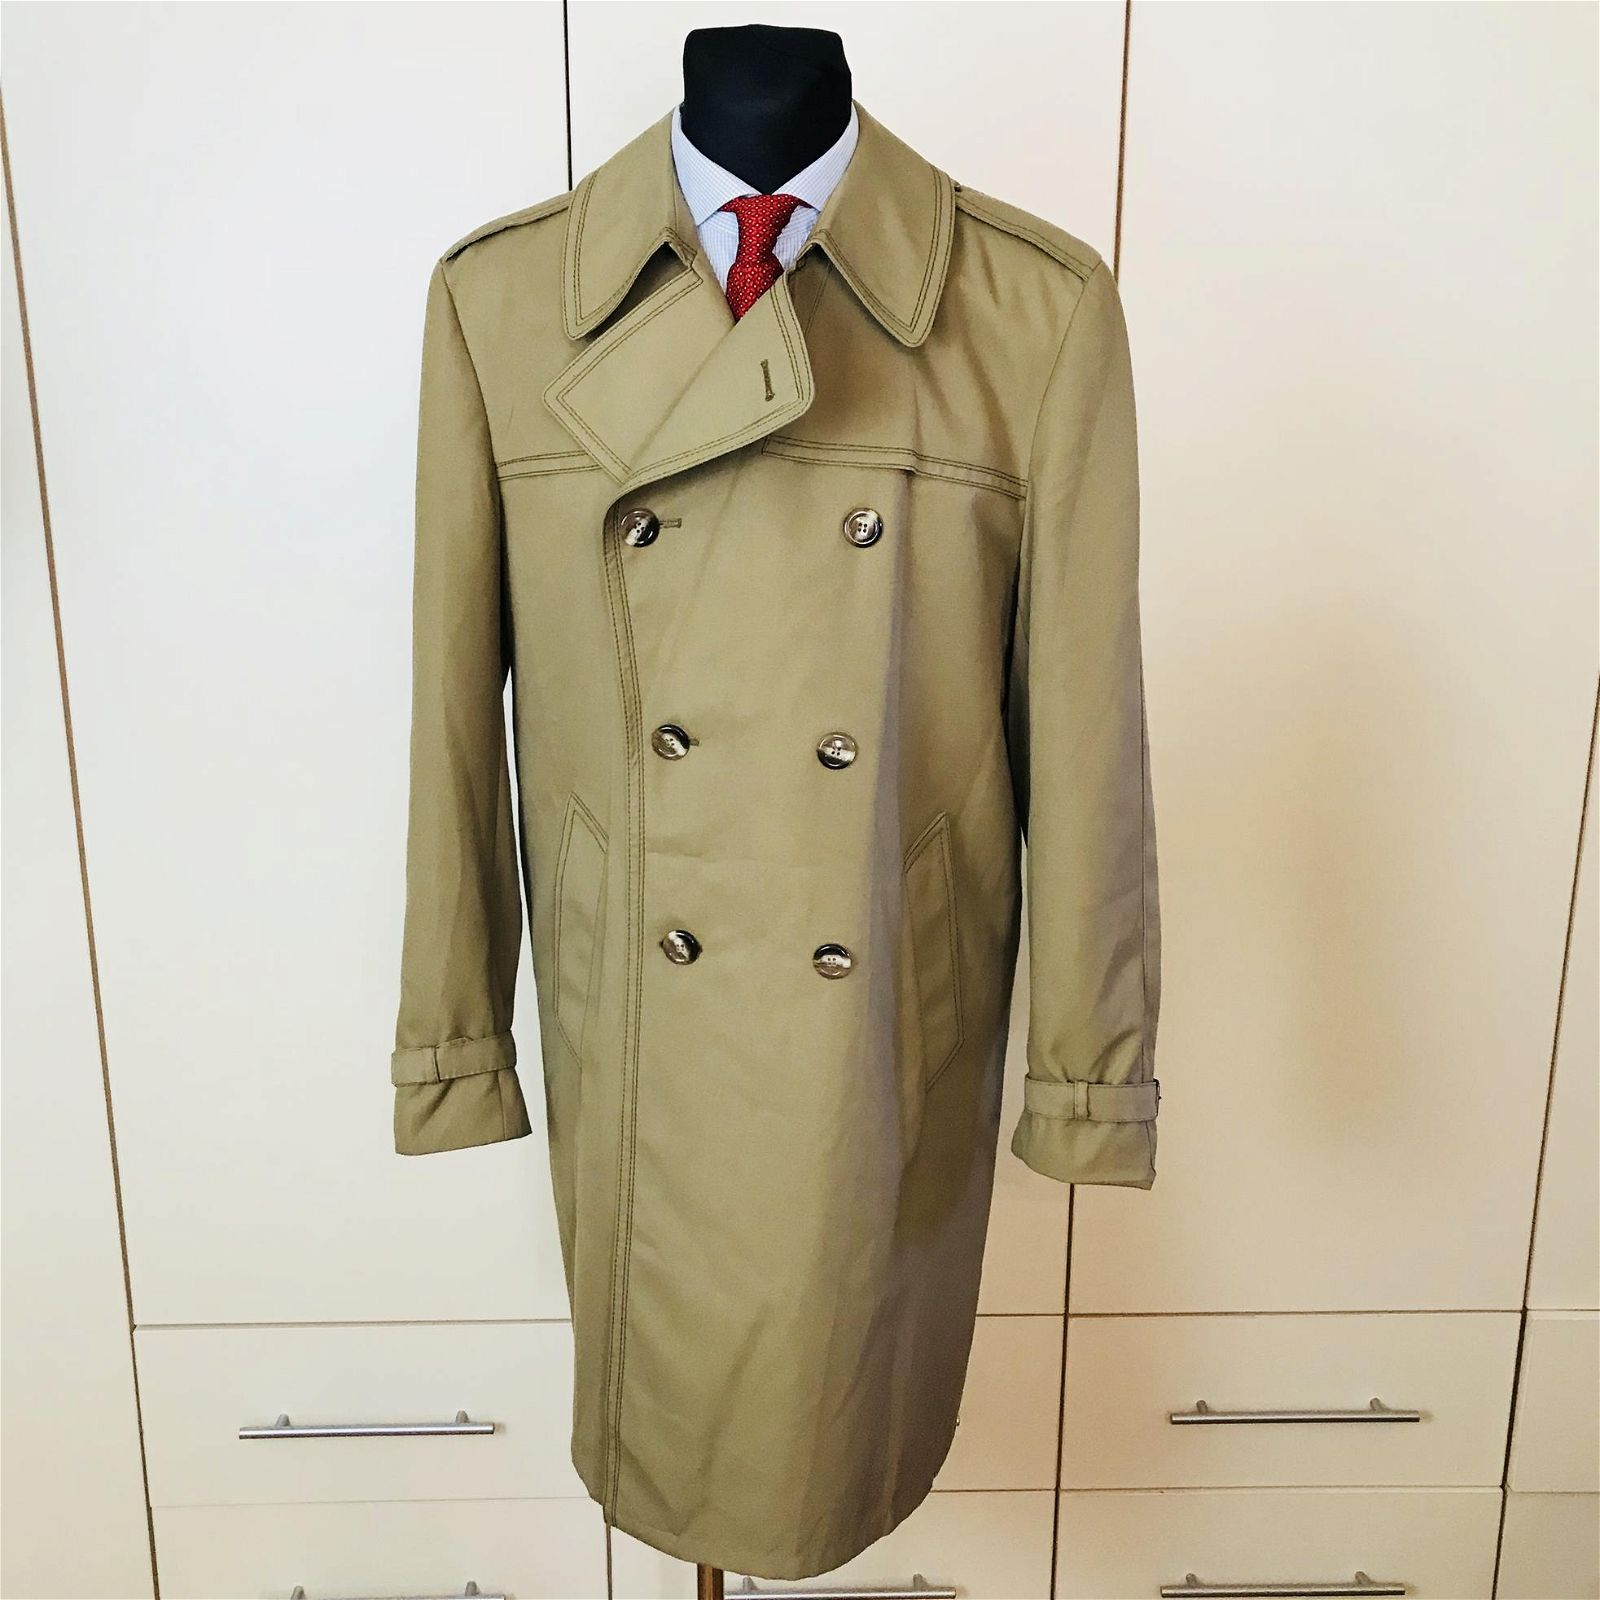 Vintage Men's Trench Coat Size US 40 / EUR 50